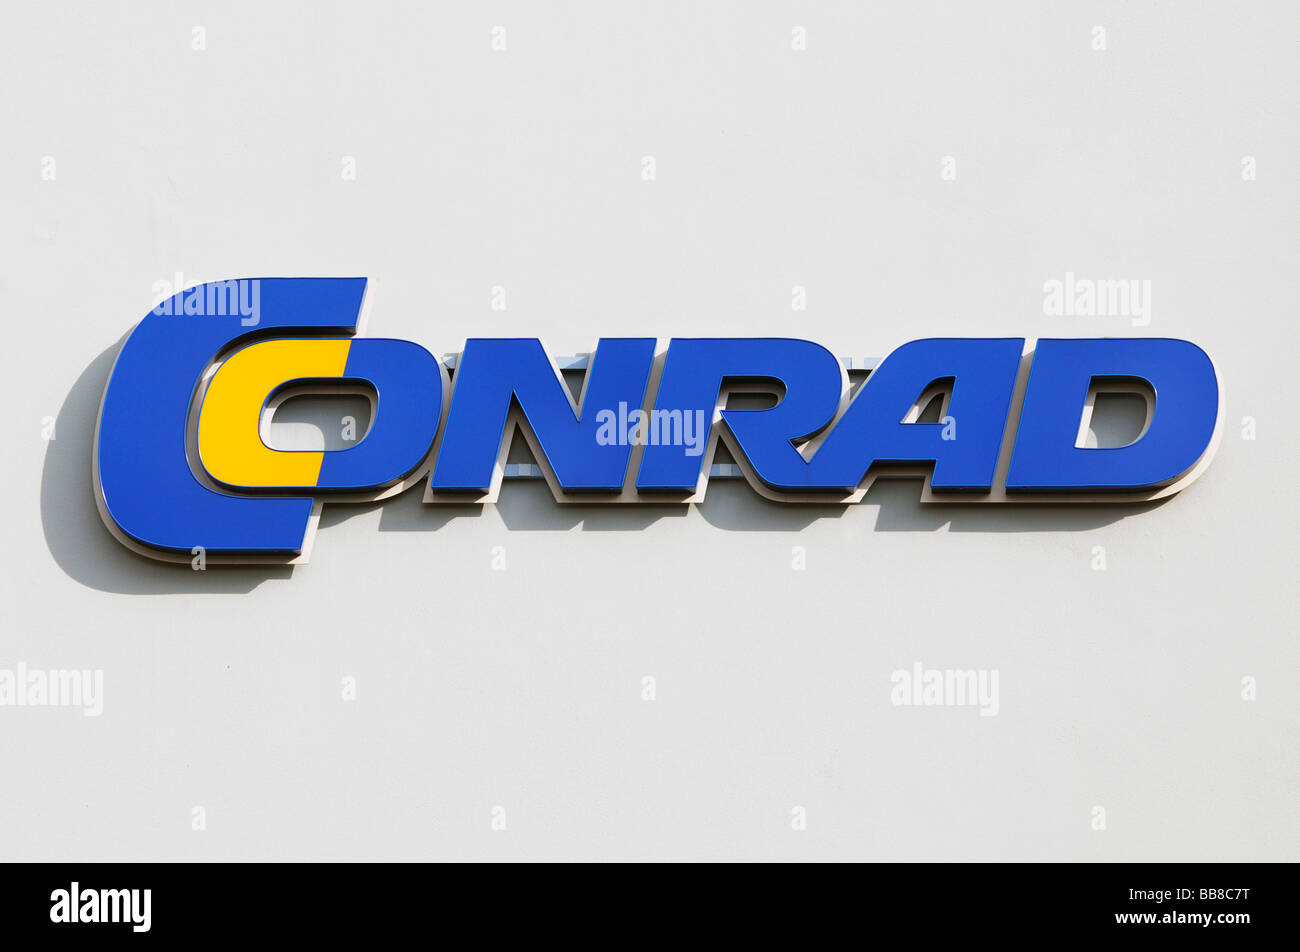 Logo, Conrad, electronics store chain - Stock Image